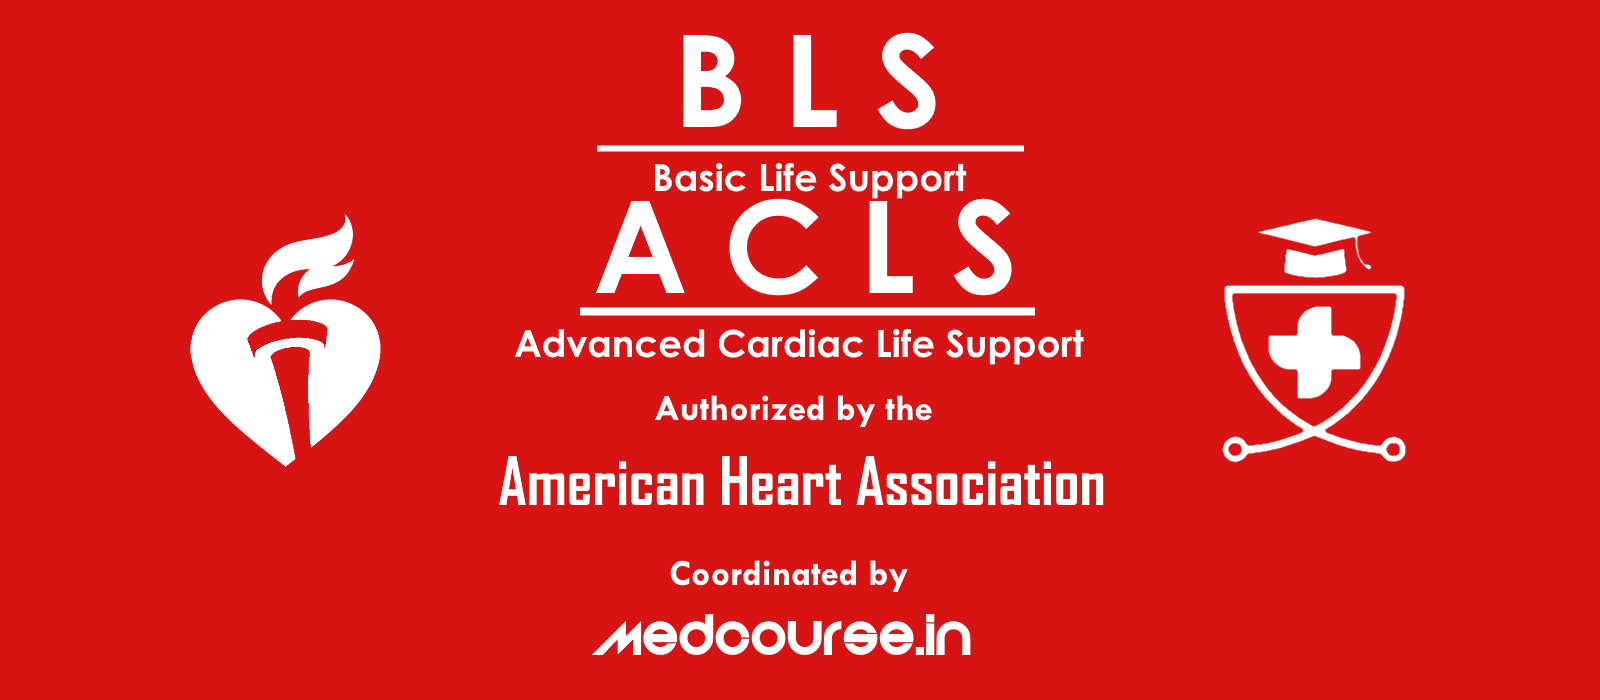 BLS-ACLS-banner